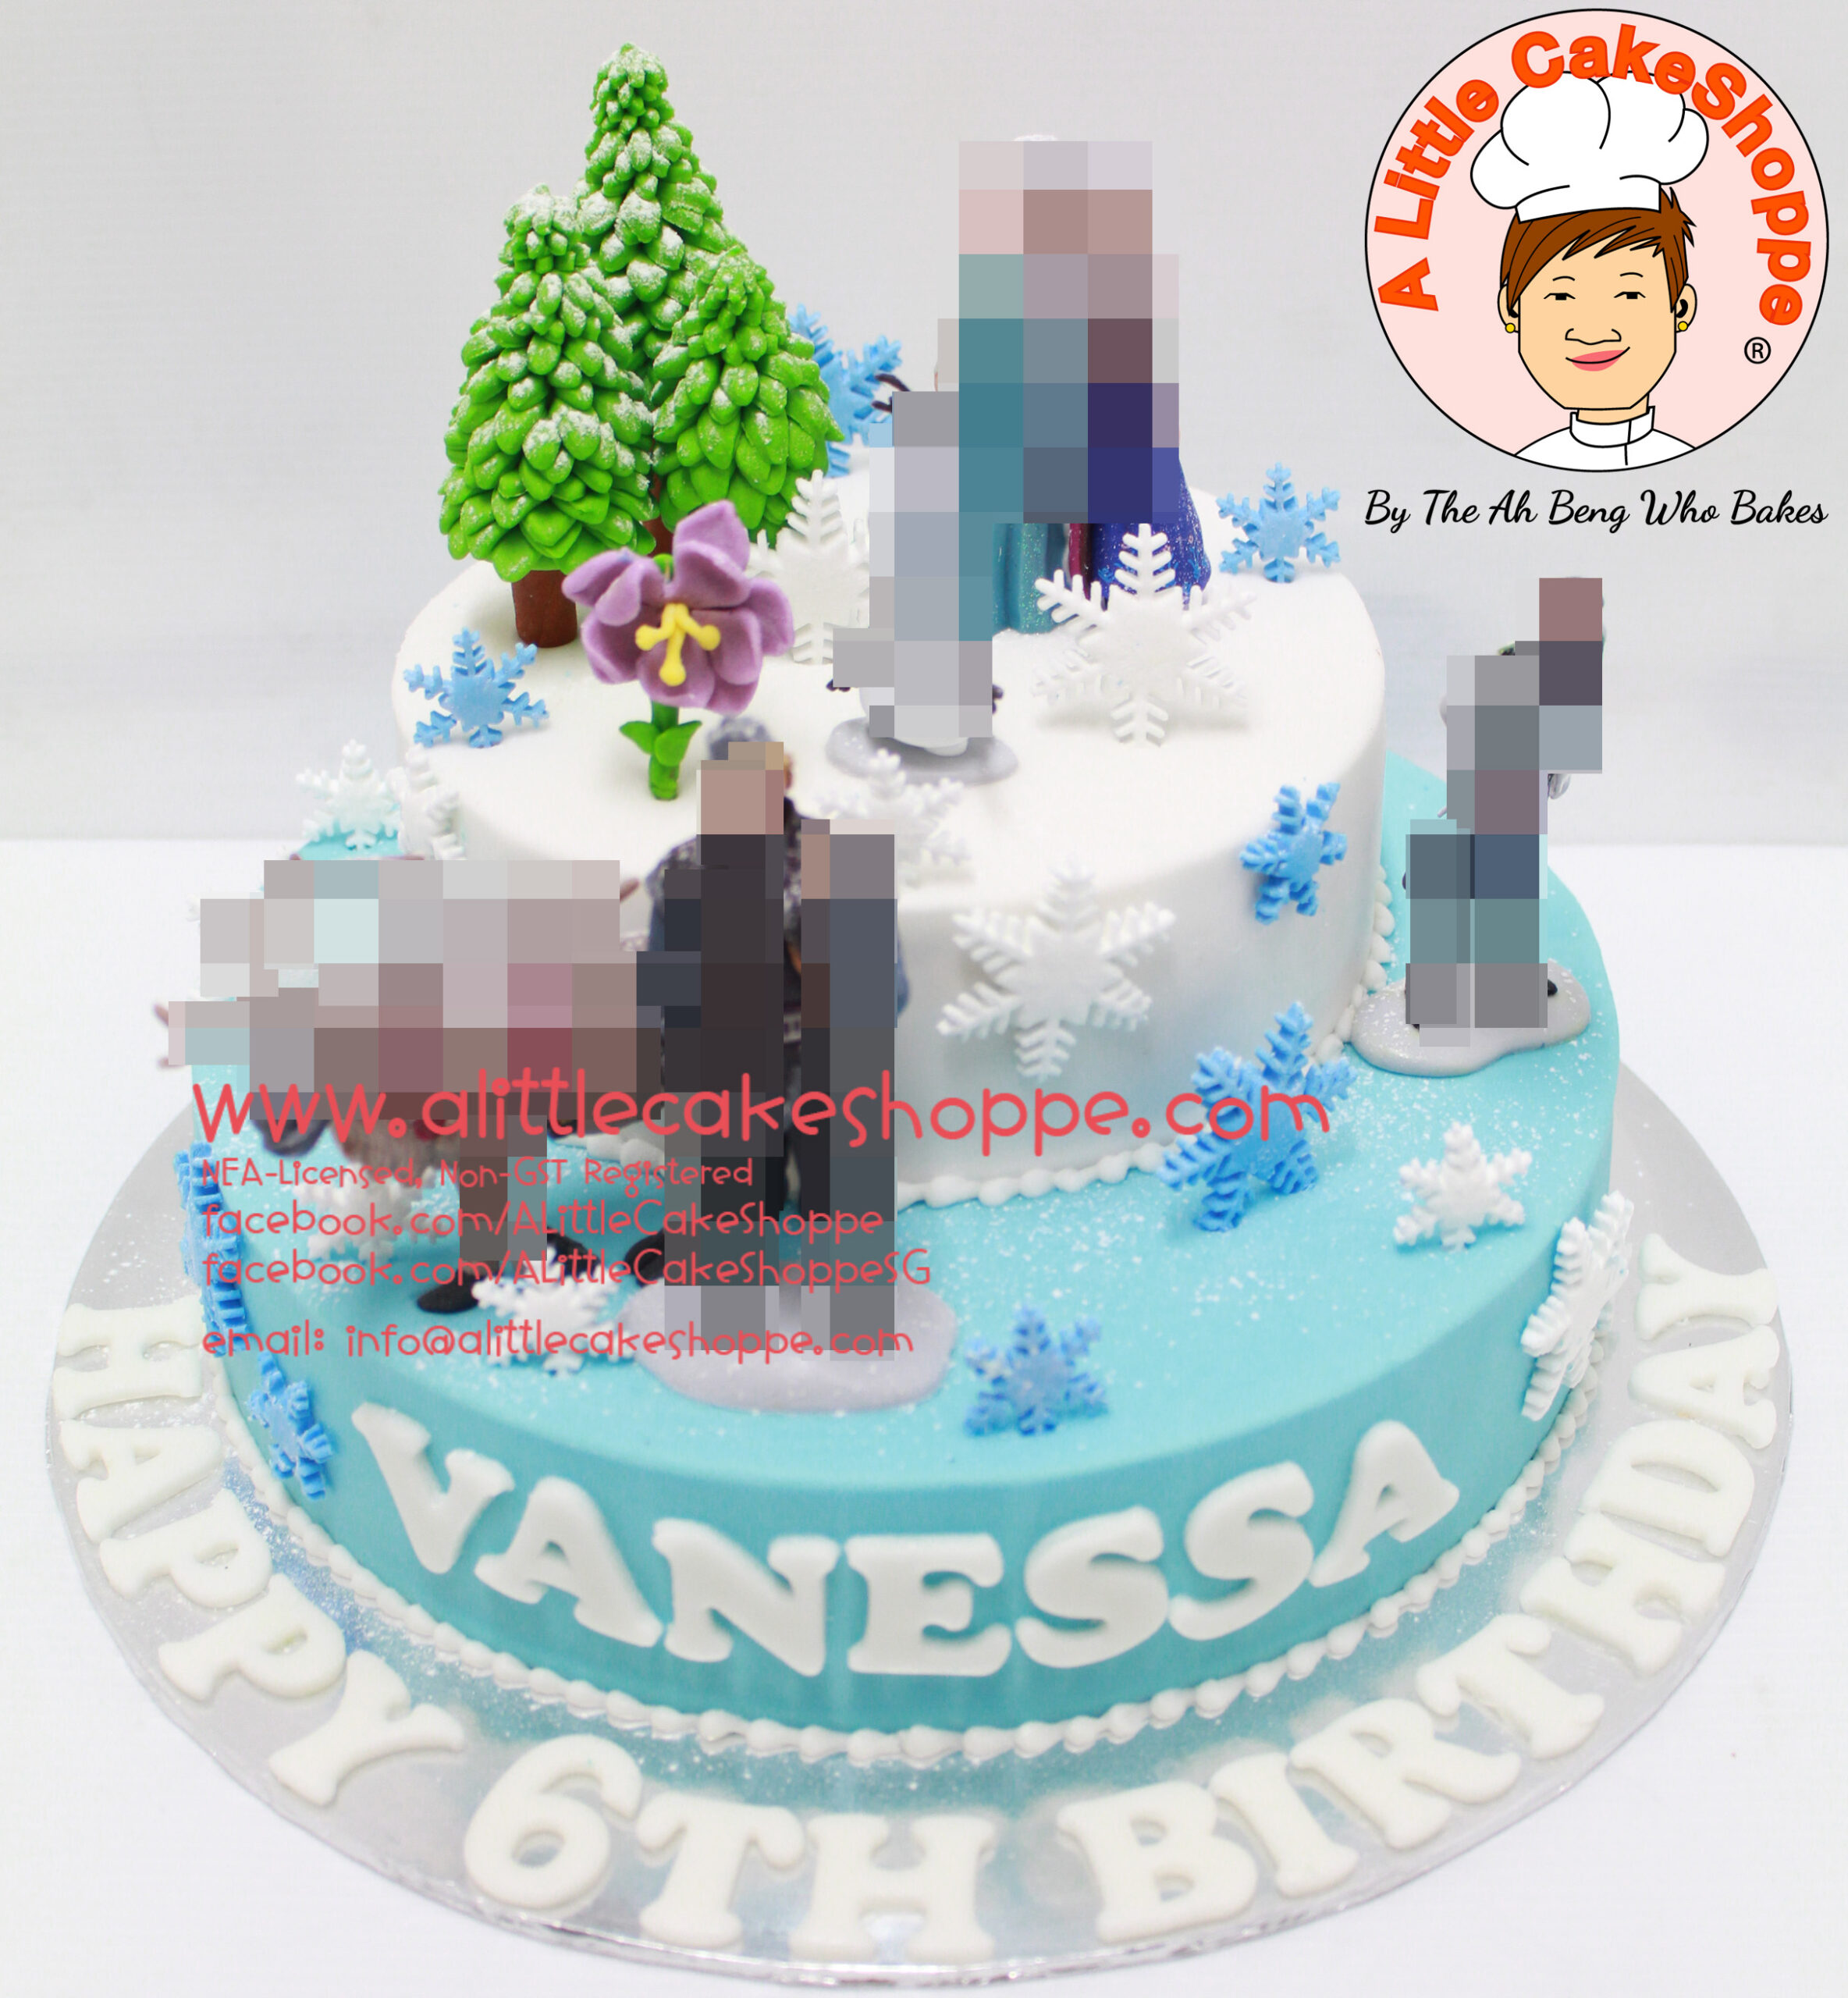 Best Customised Cake Shop Singapore custom cake 2D 3D birthday cake cupcakes desserts wedding corporate events anniversary 1st birthday 21st birthday fondant fresh cream buttercream cakes alittlecakeshoppe a little cake shoppe compliments review singapore bakers SG cake shop cakeshop ah beng who bakes princess frozen